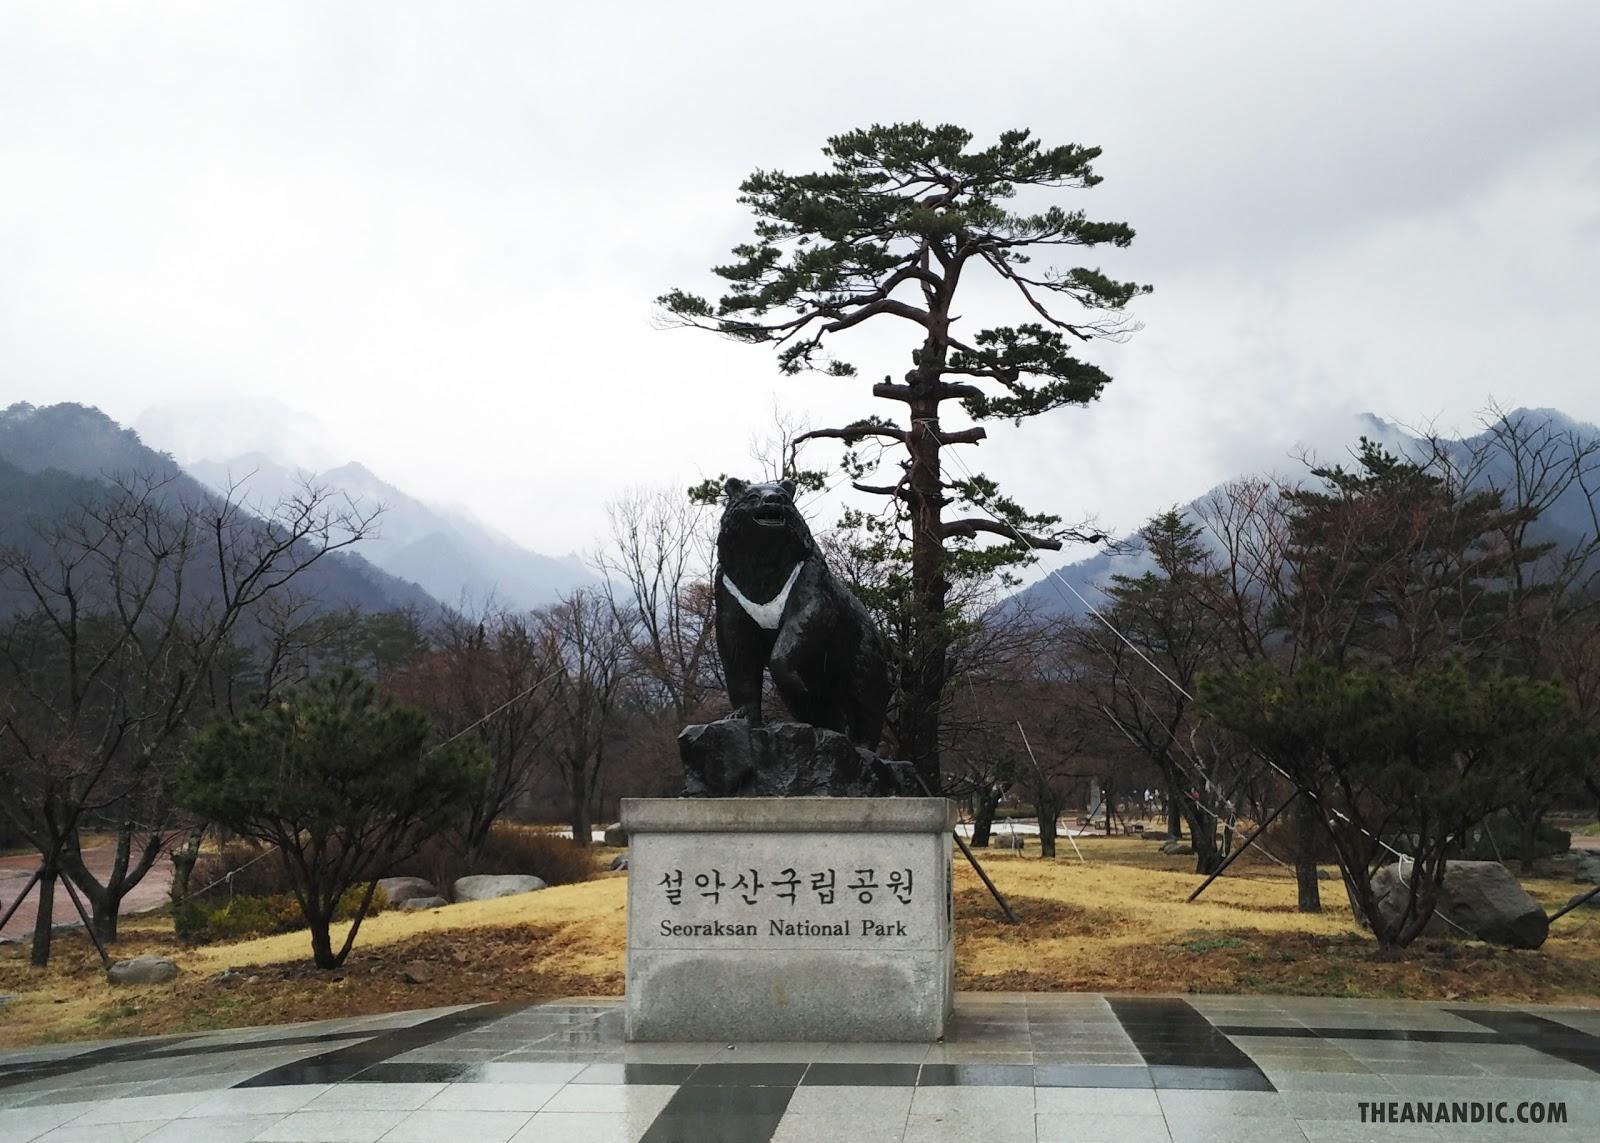 MELIHAT PEGUNUNGAN SALJU DI SEORAKSAN NATIONAL PARK, KOREA SELATAN